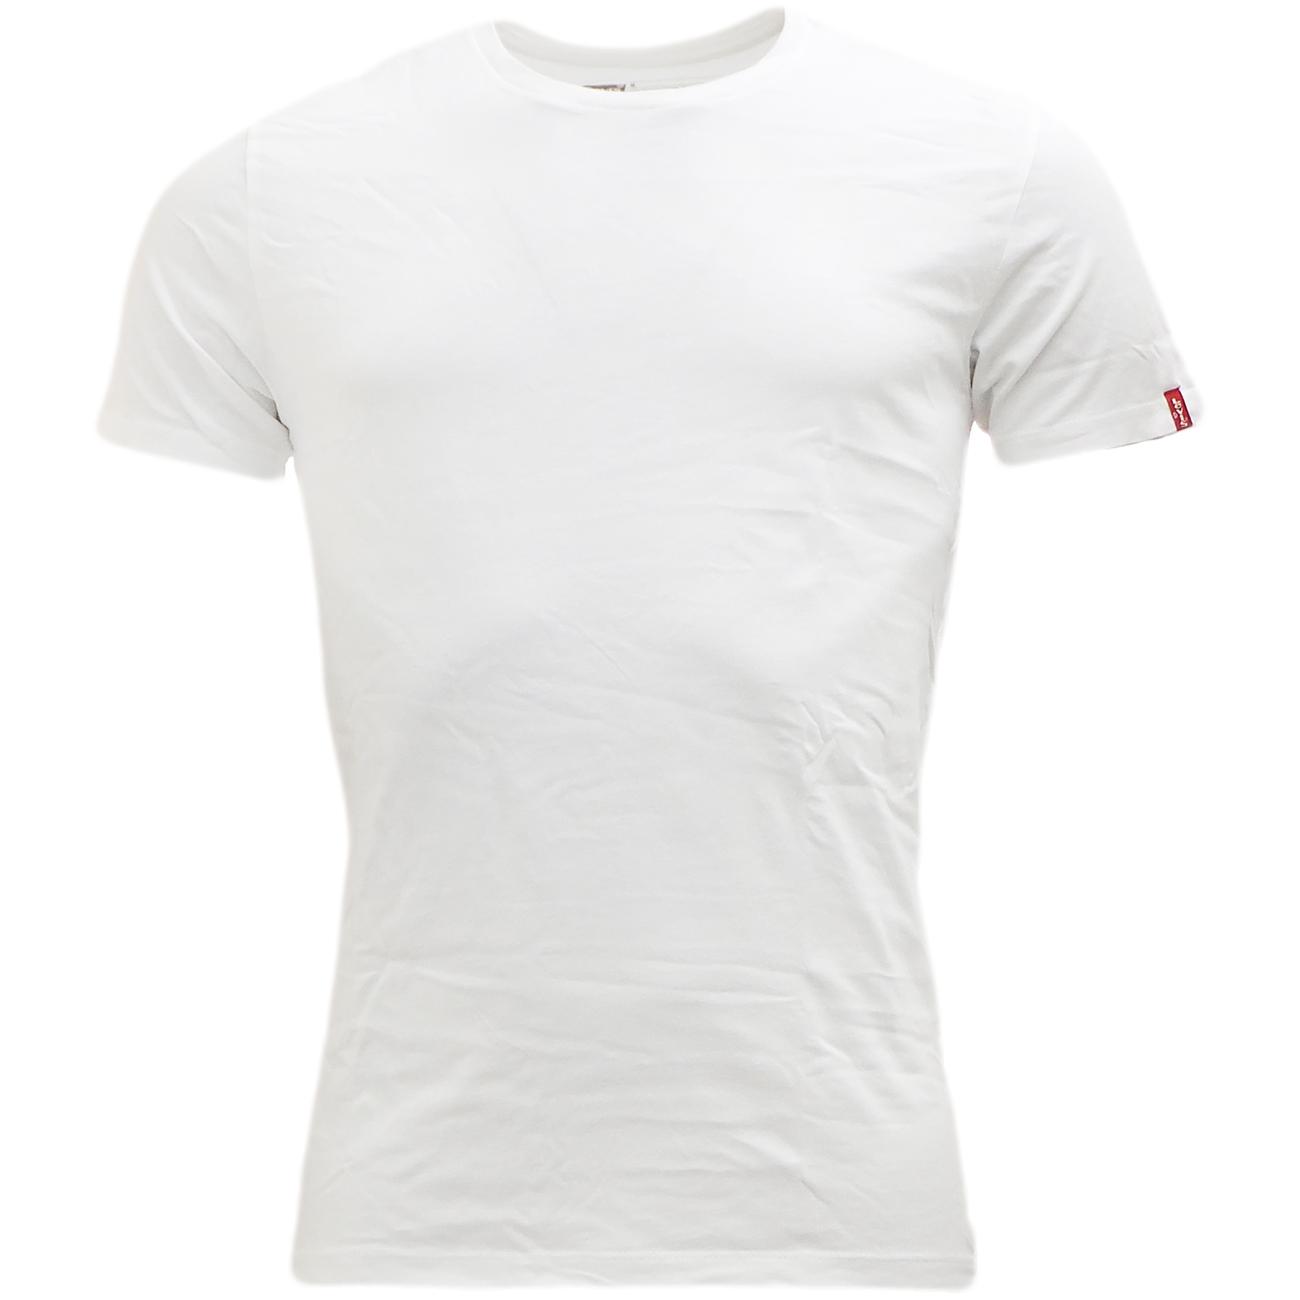 Levi strauss t shirt ebay for Levis plain t shirts